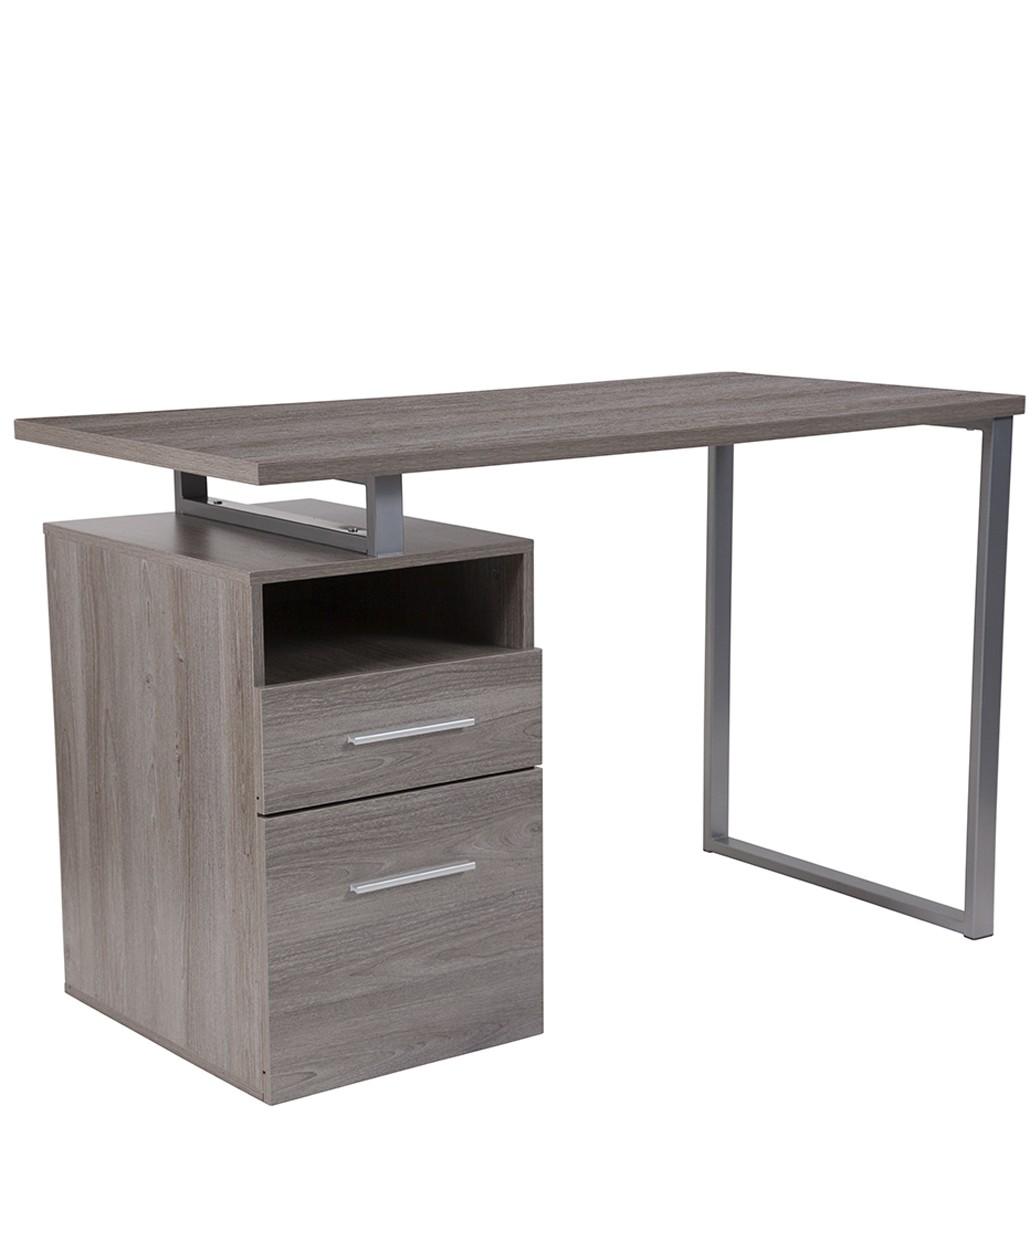 Martel Manicure Table w/ Metal Frame